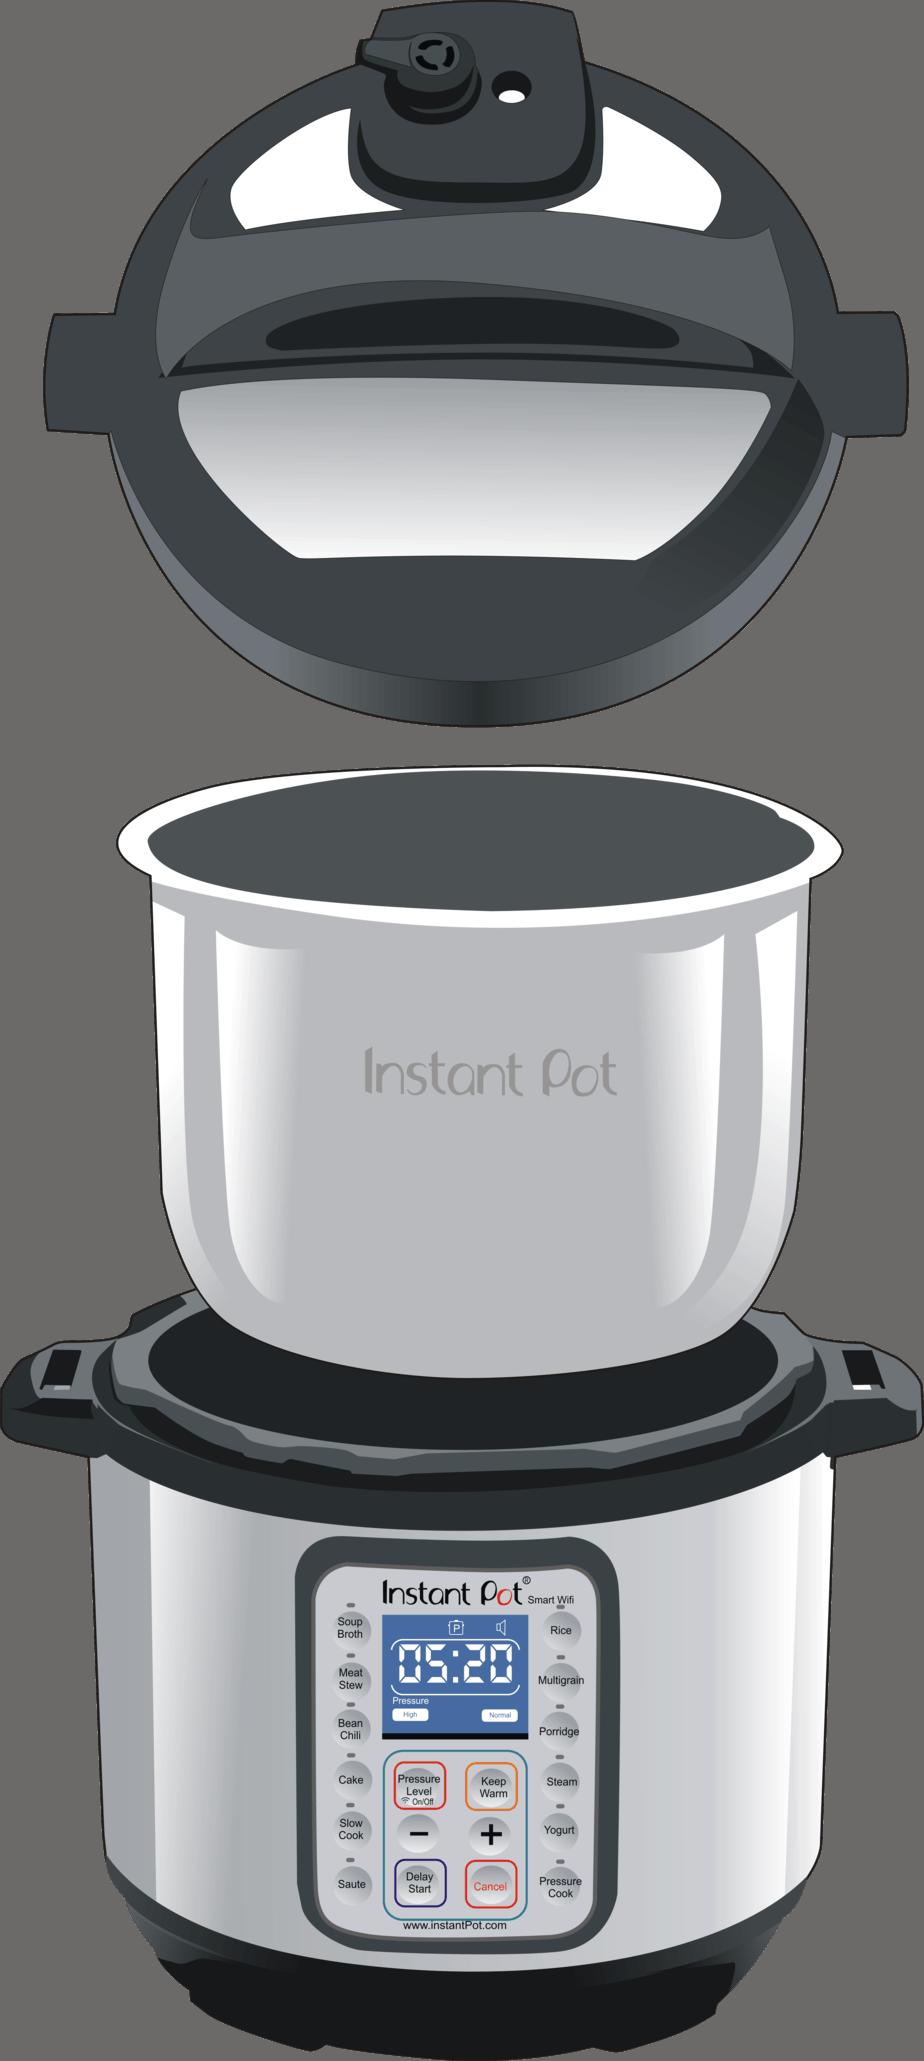 Instant Pot Smart WIfi